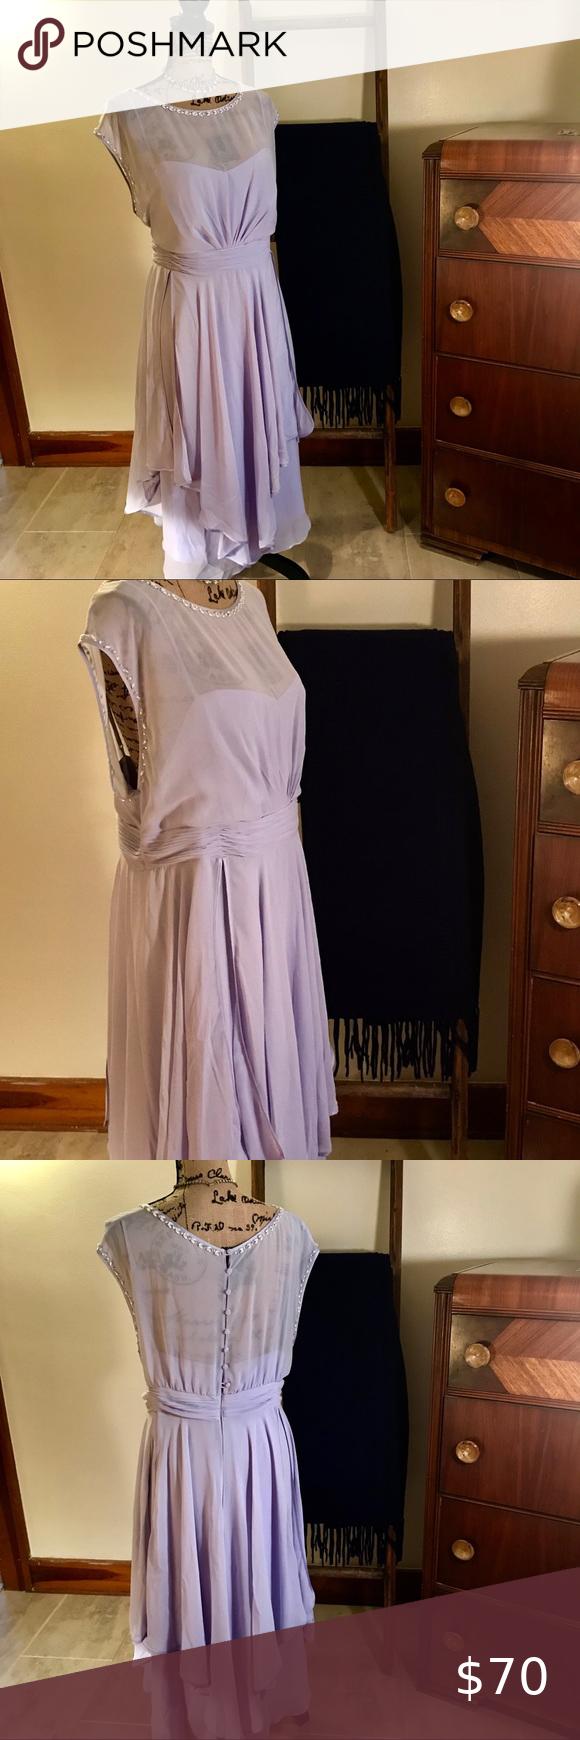 Women S Monsoon Lavender Formal Dress Size 18 Size 18 Women Colorful Dresses Formal Dresses [ 1740 x 580 Pixel ]